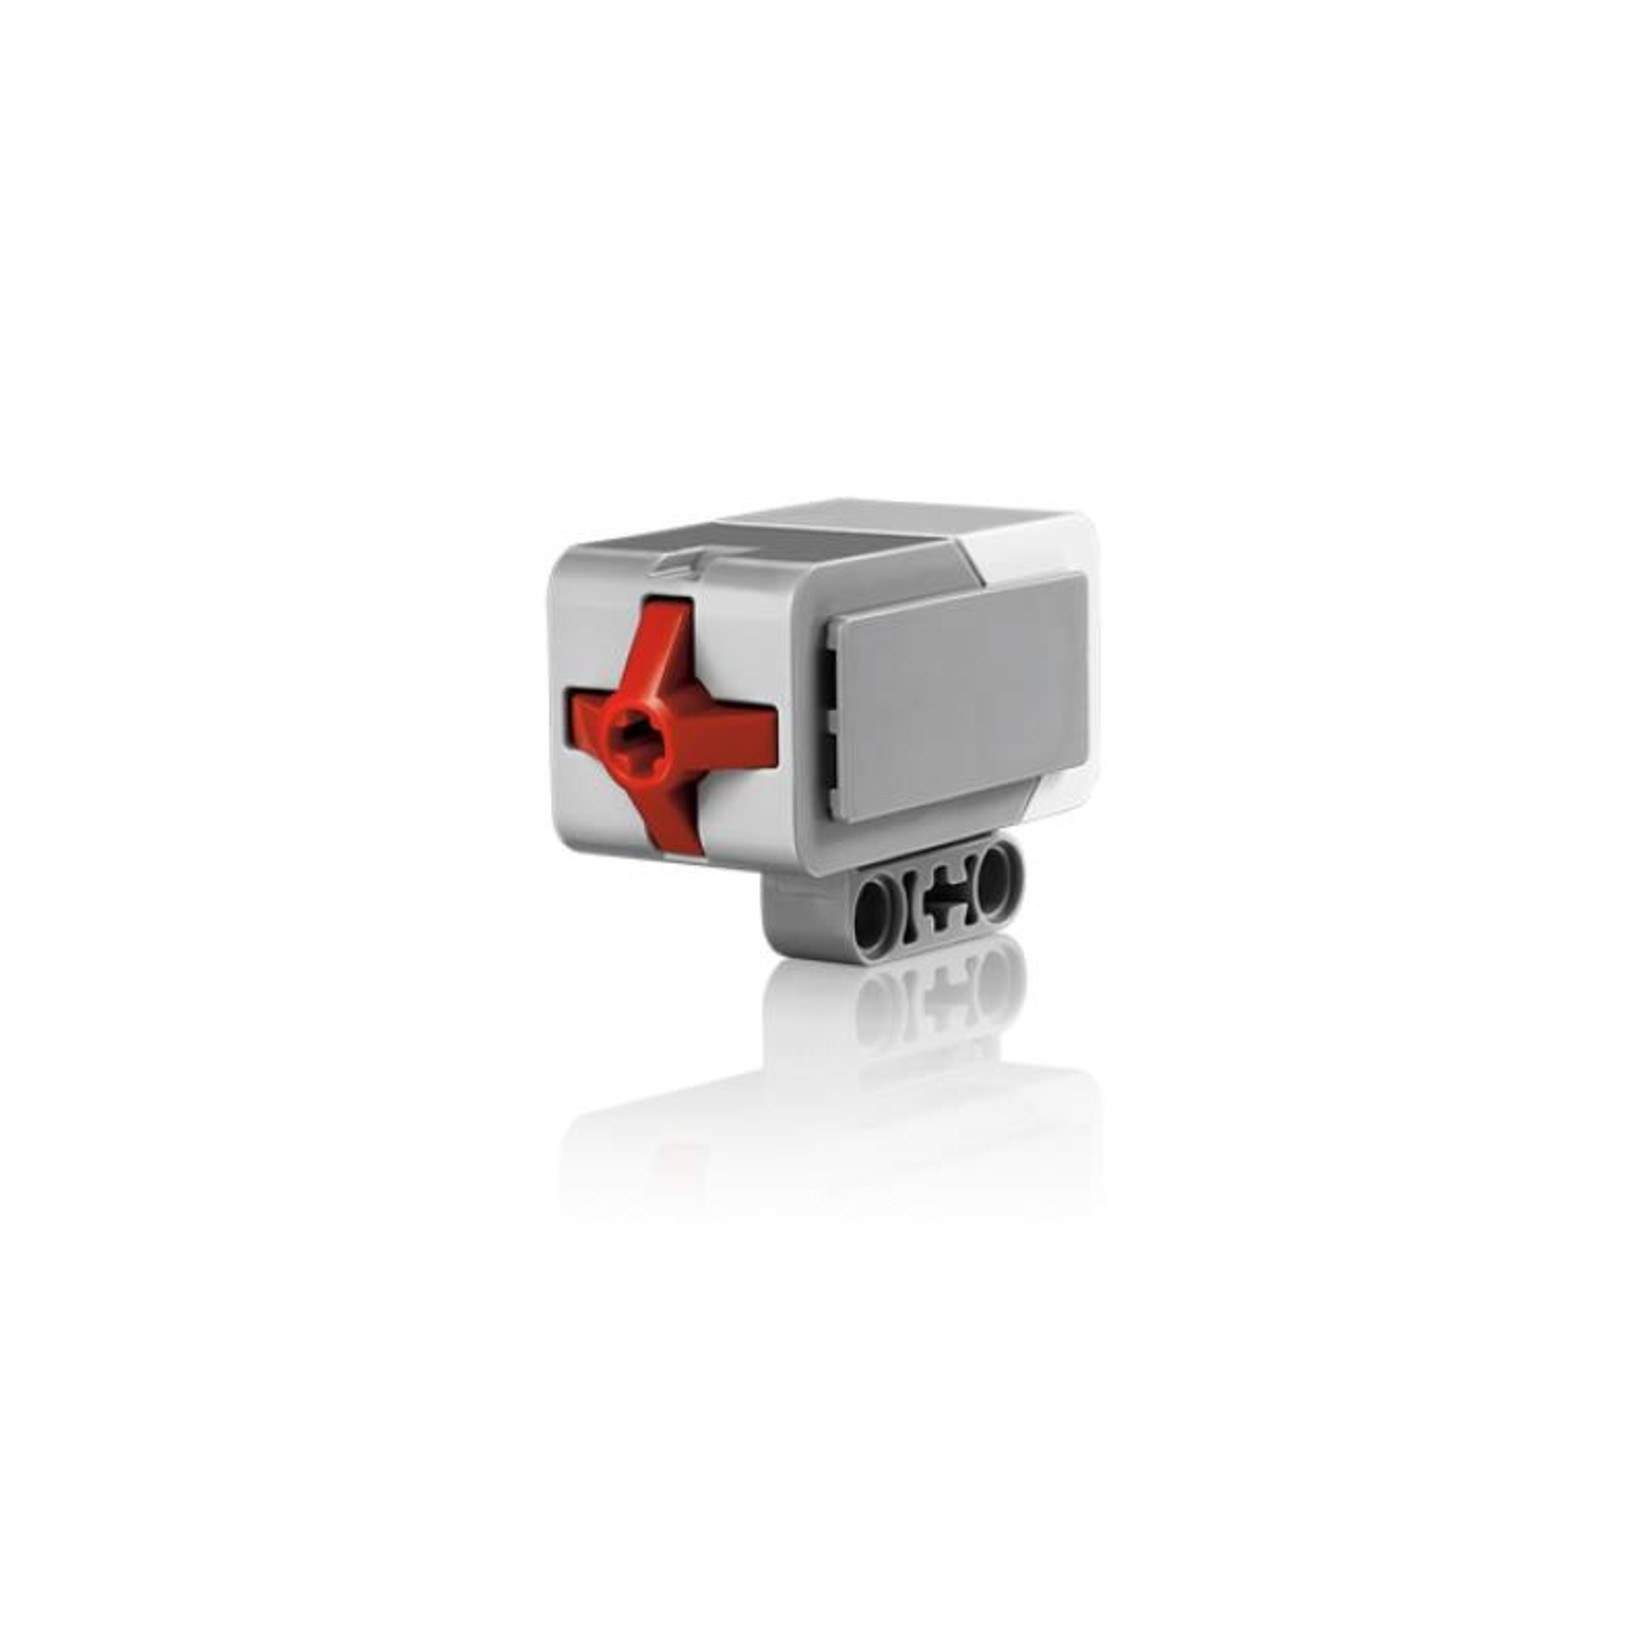 LEGO® Education EV3 Aanraak Sensor